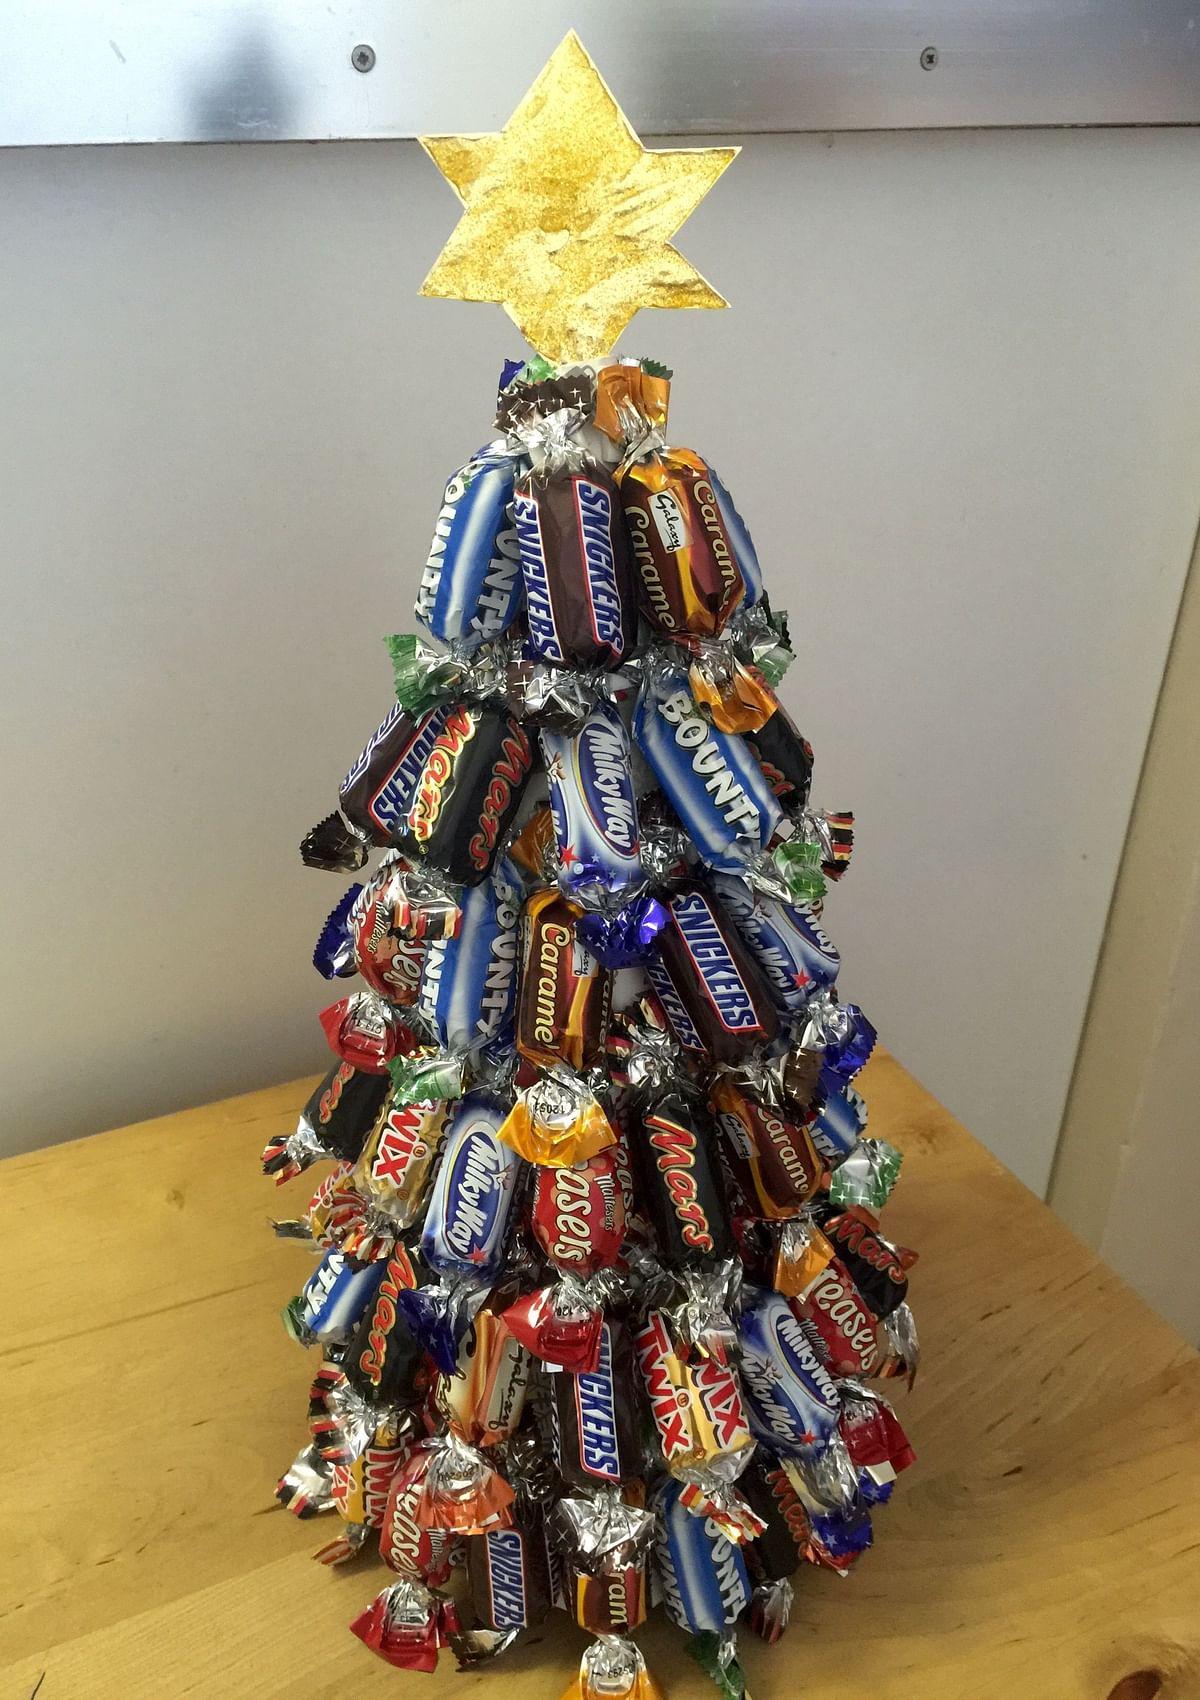 A chocolate Christmas tree.